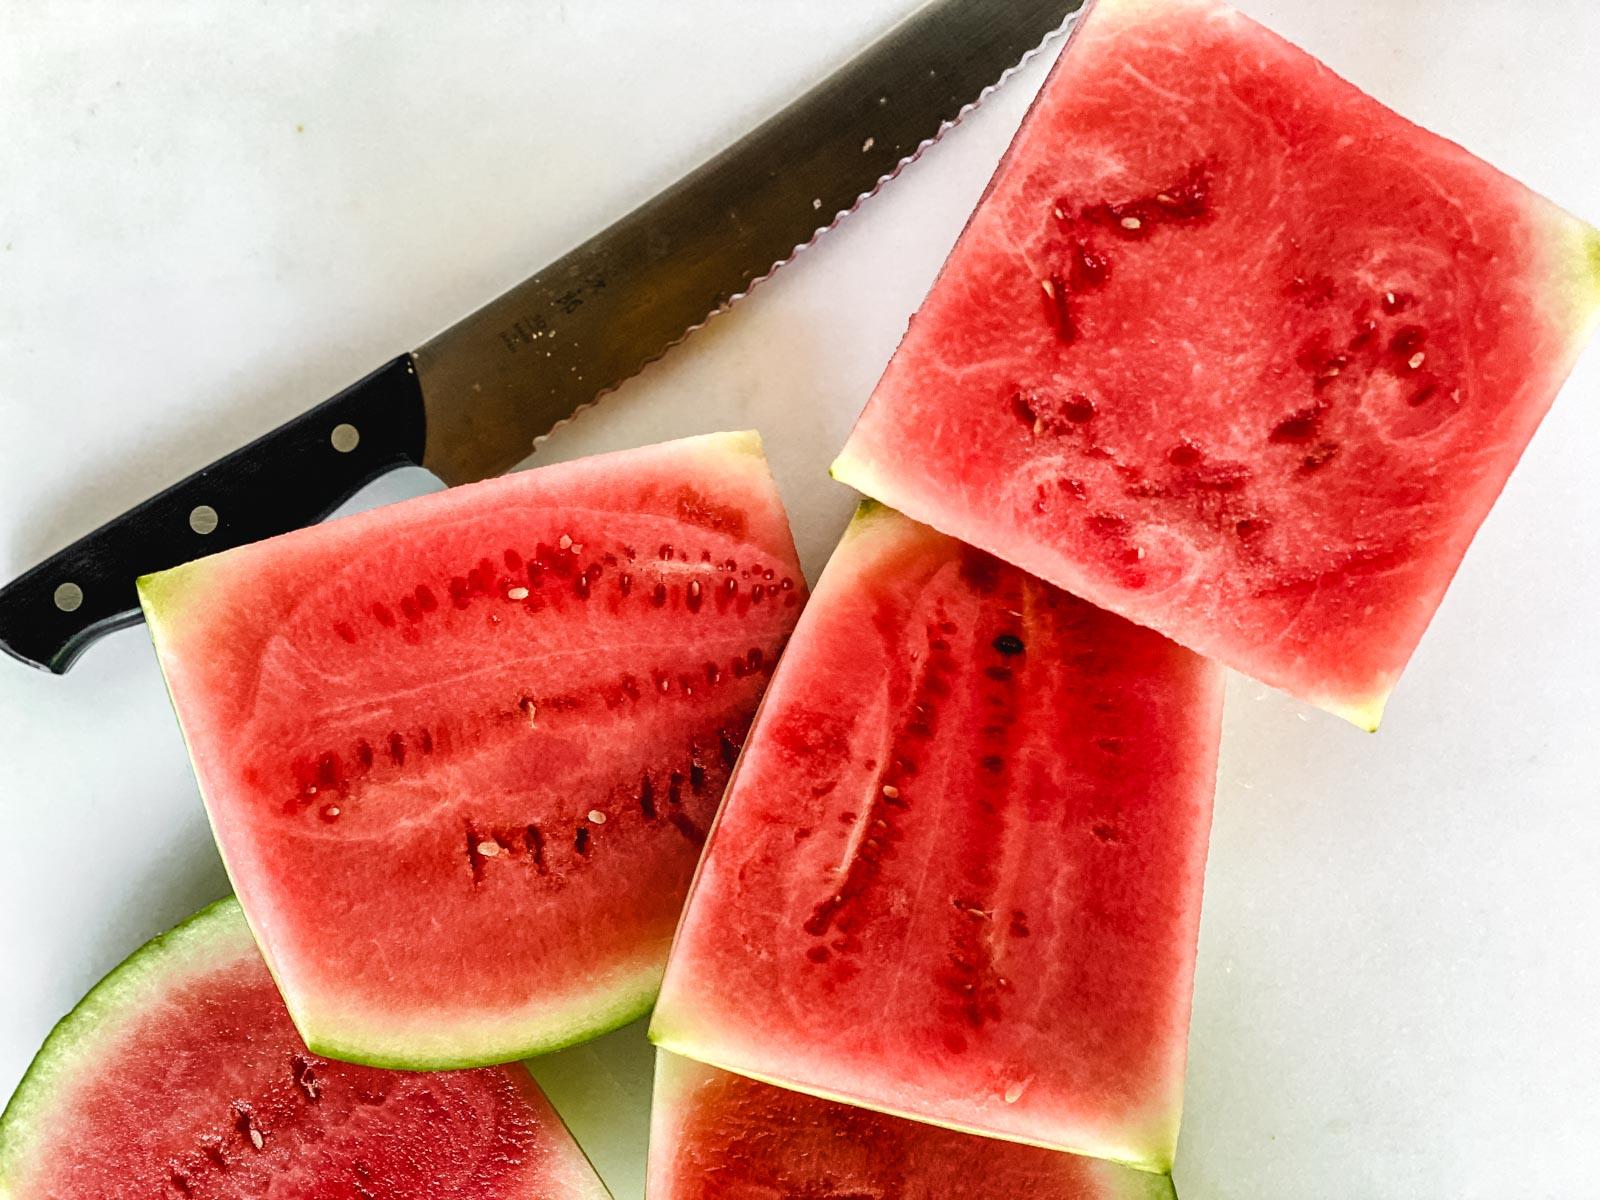 slicing rind off watermelon